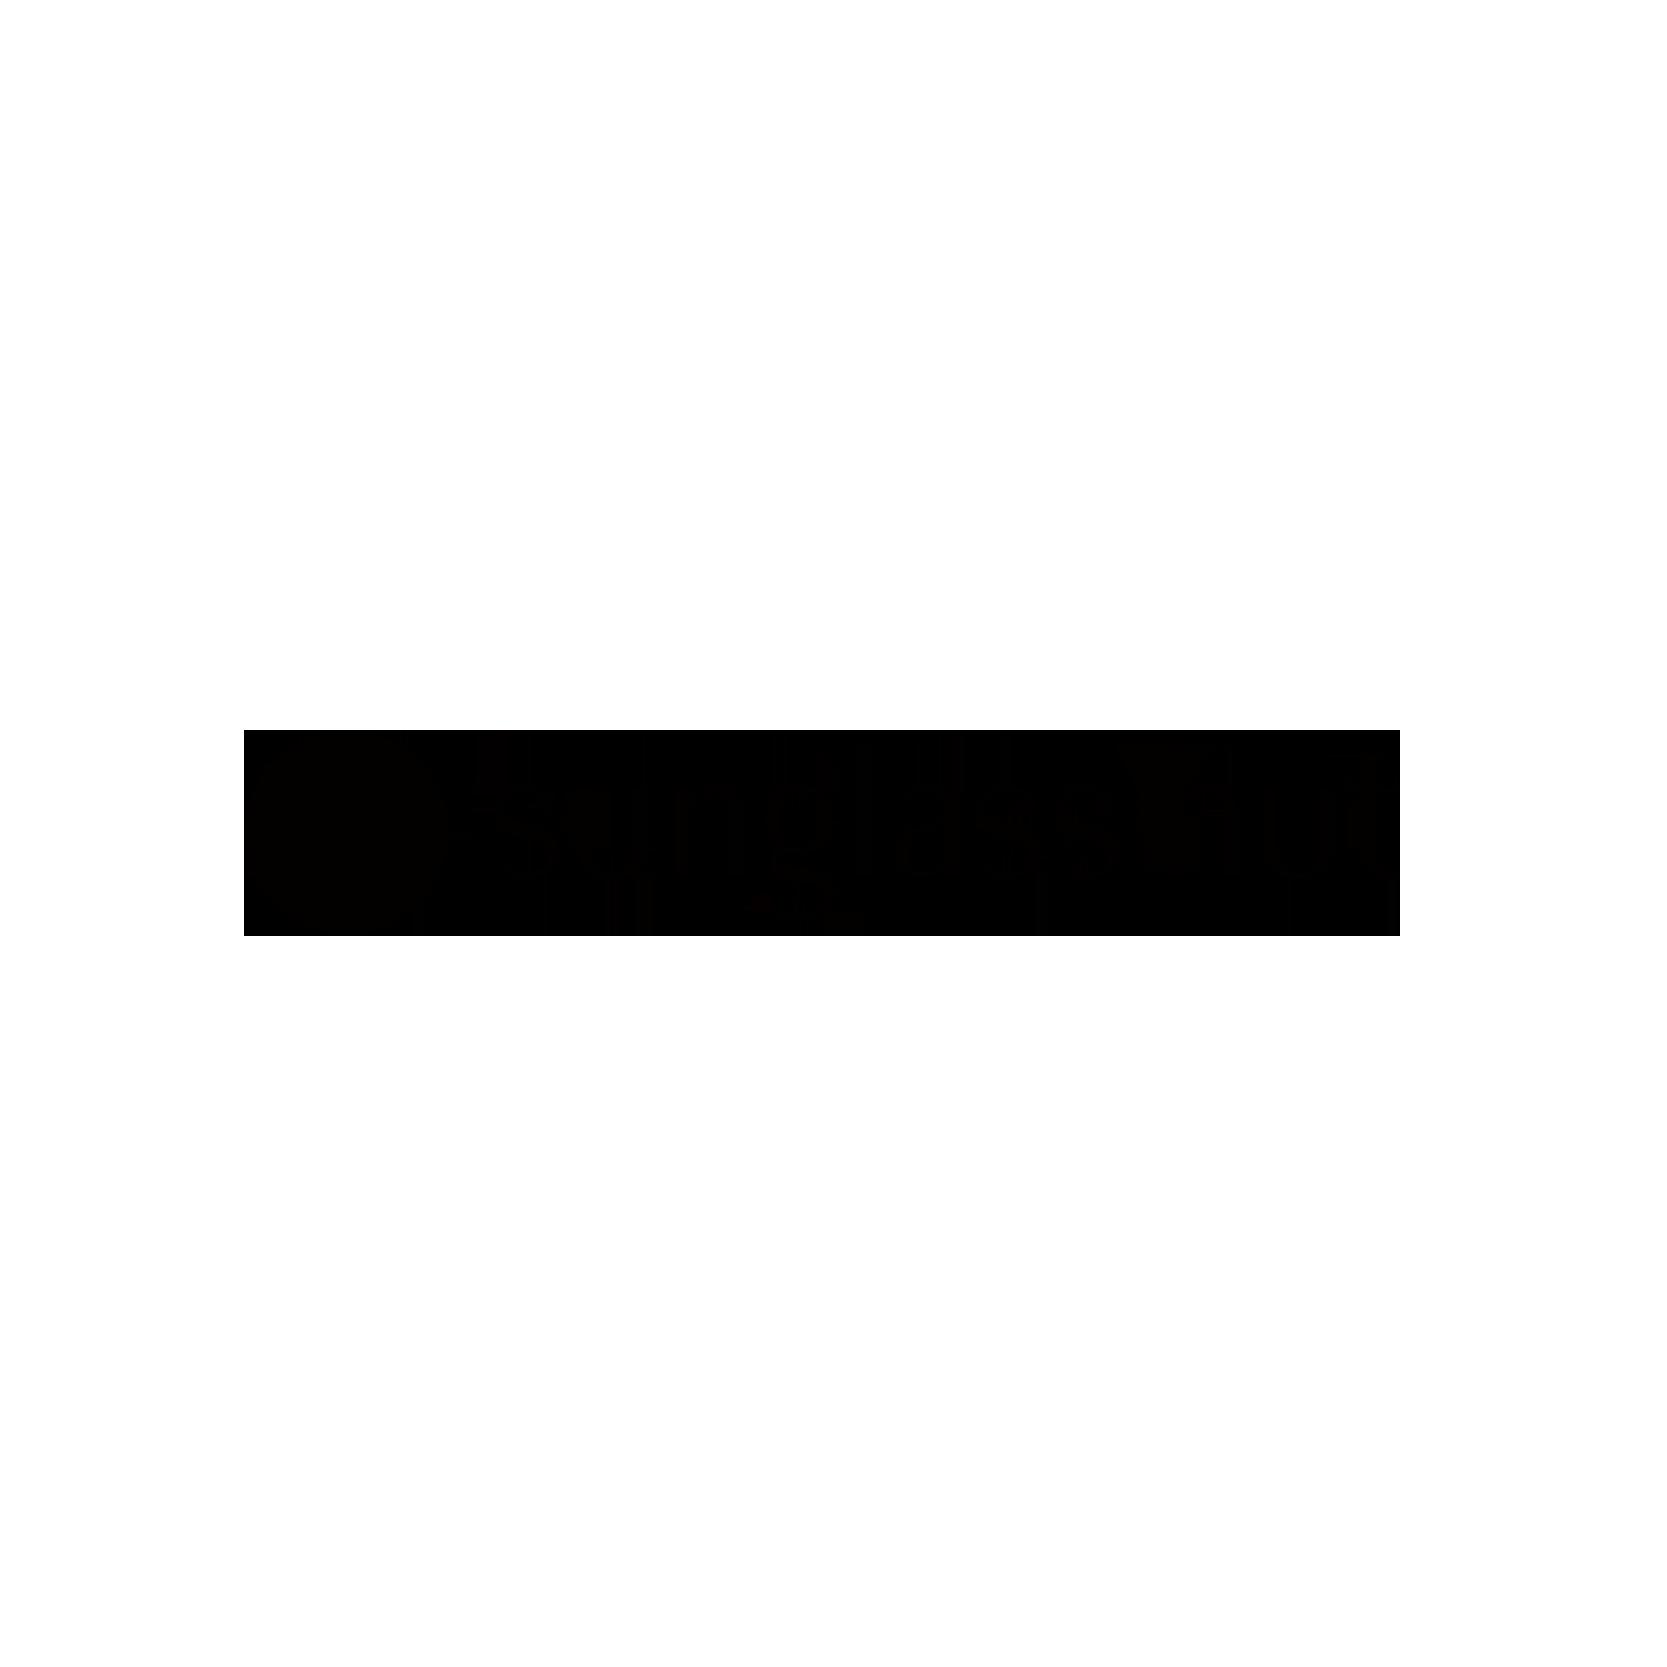 Logos-PagWeb-14